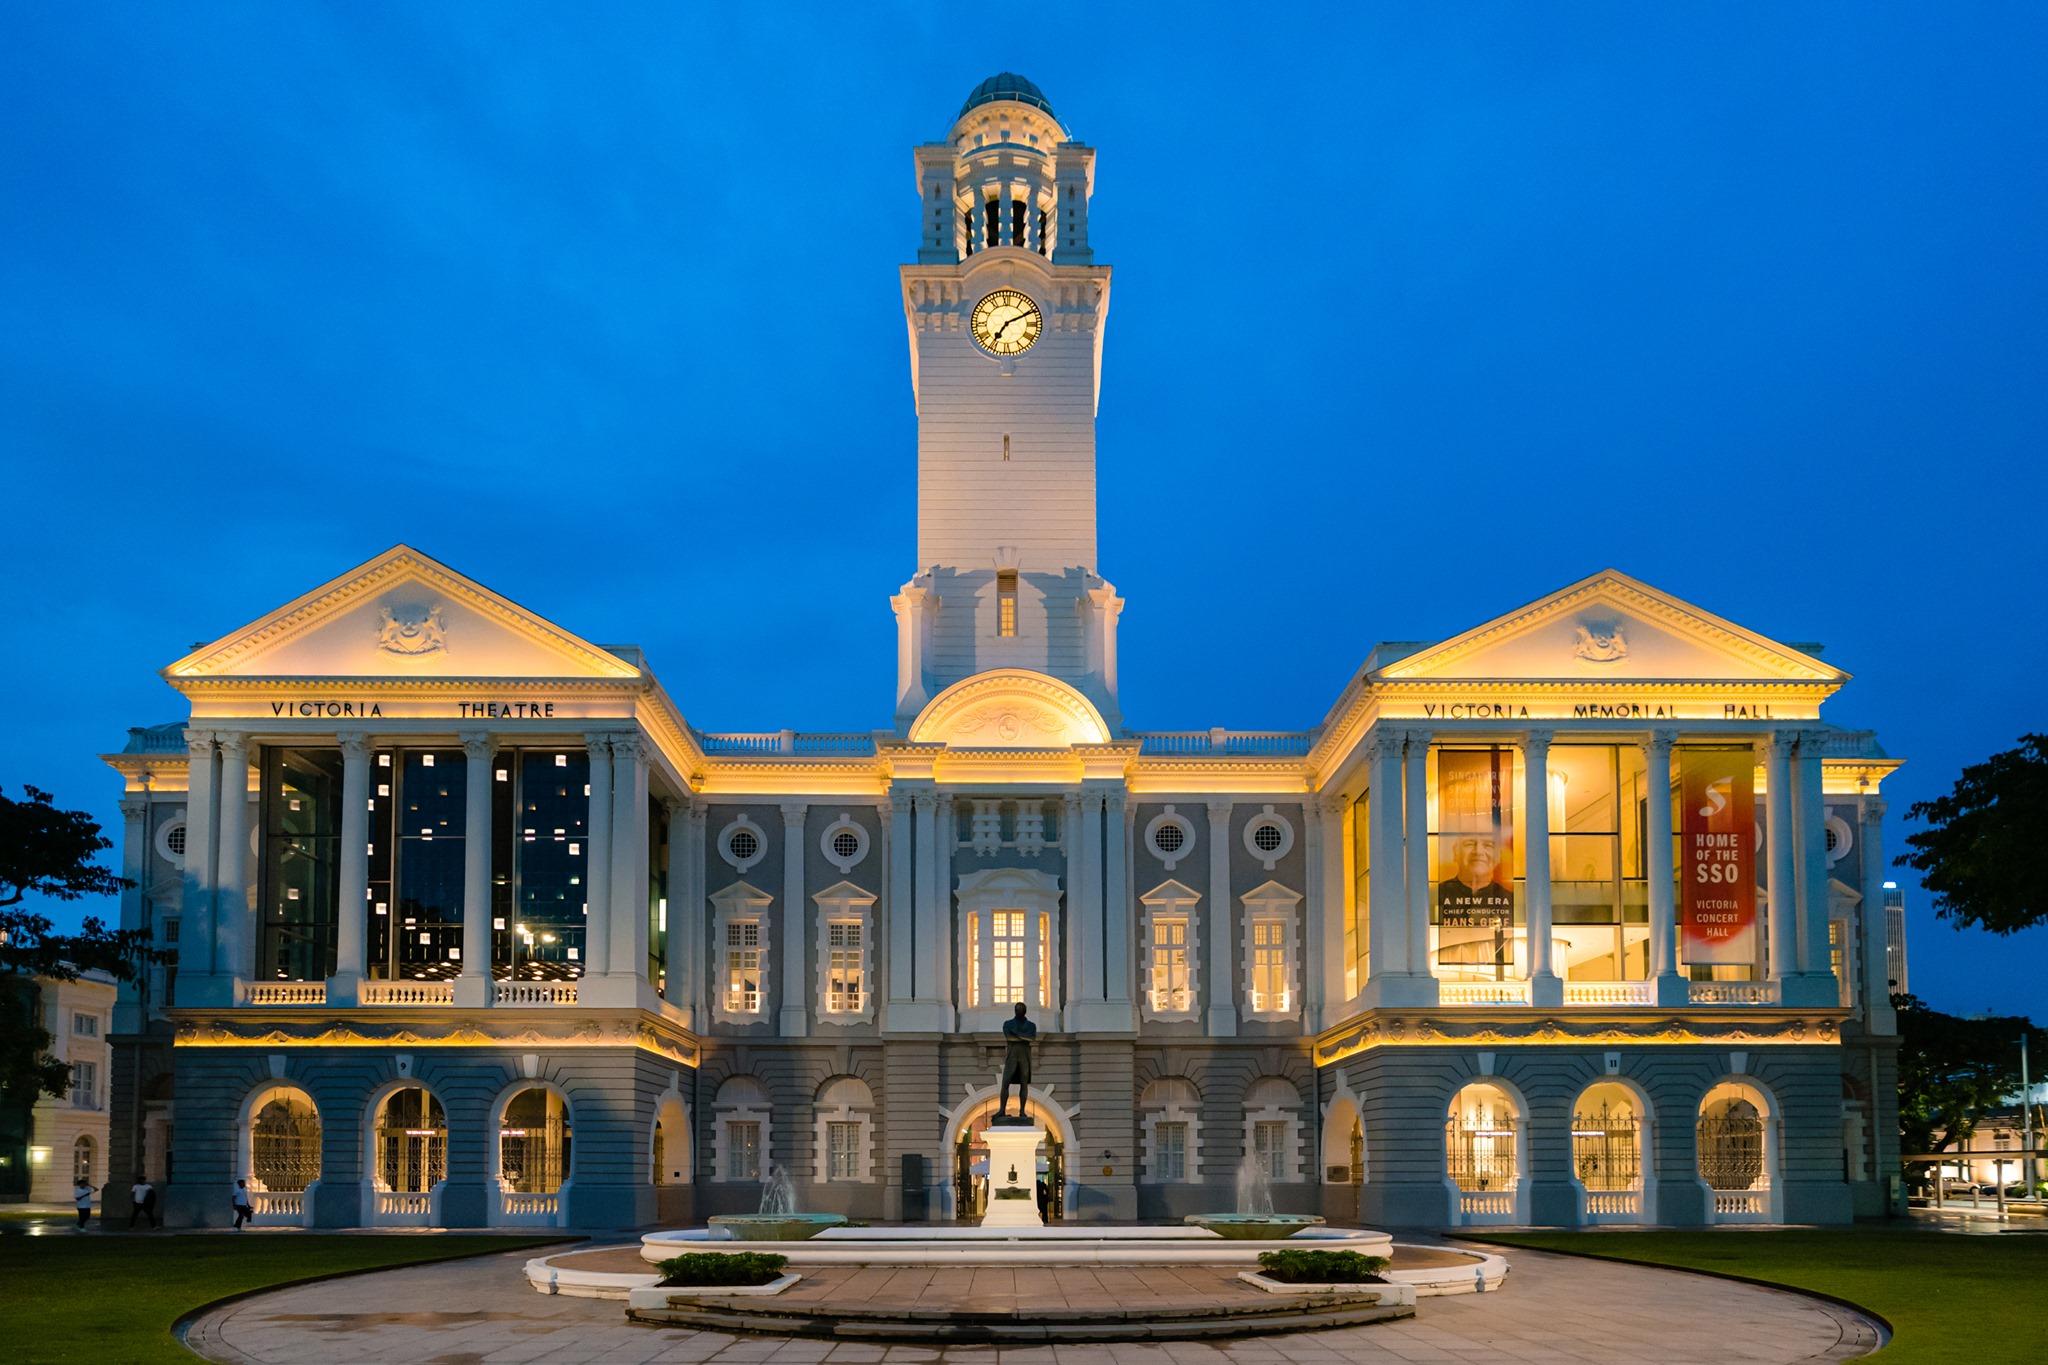 Victoria Theatre and Concert Hall Singapore